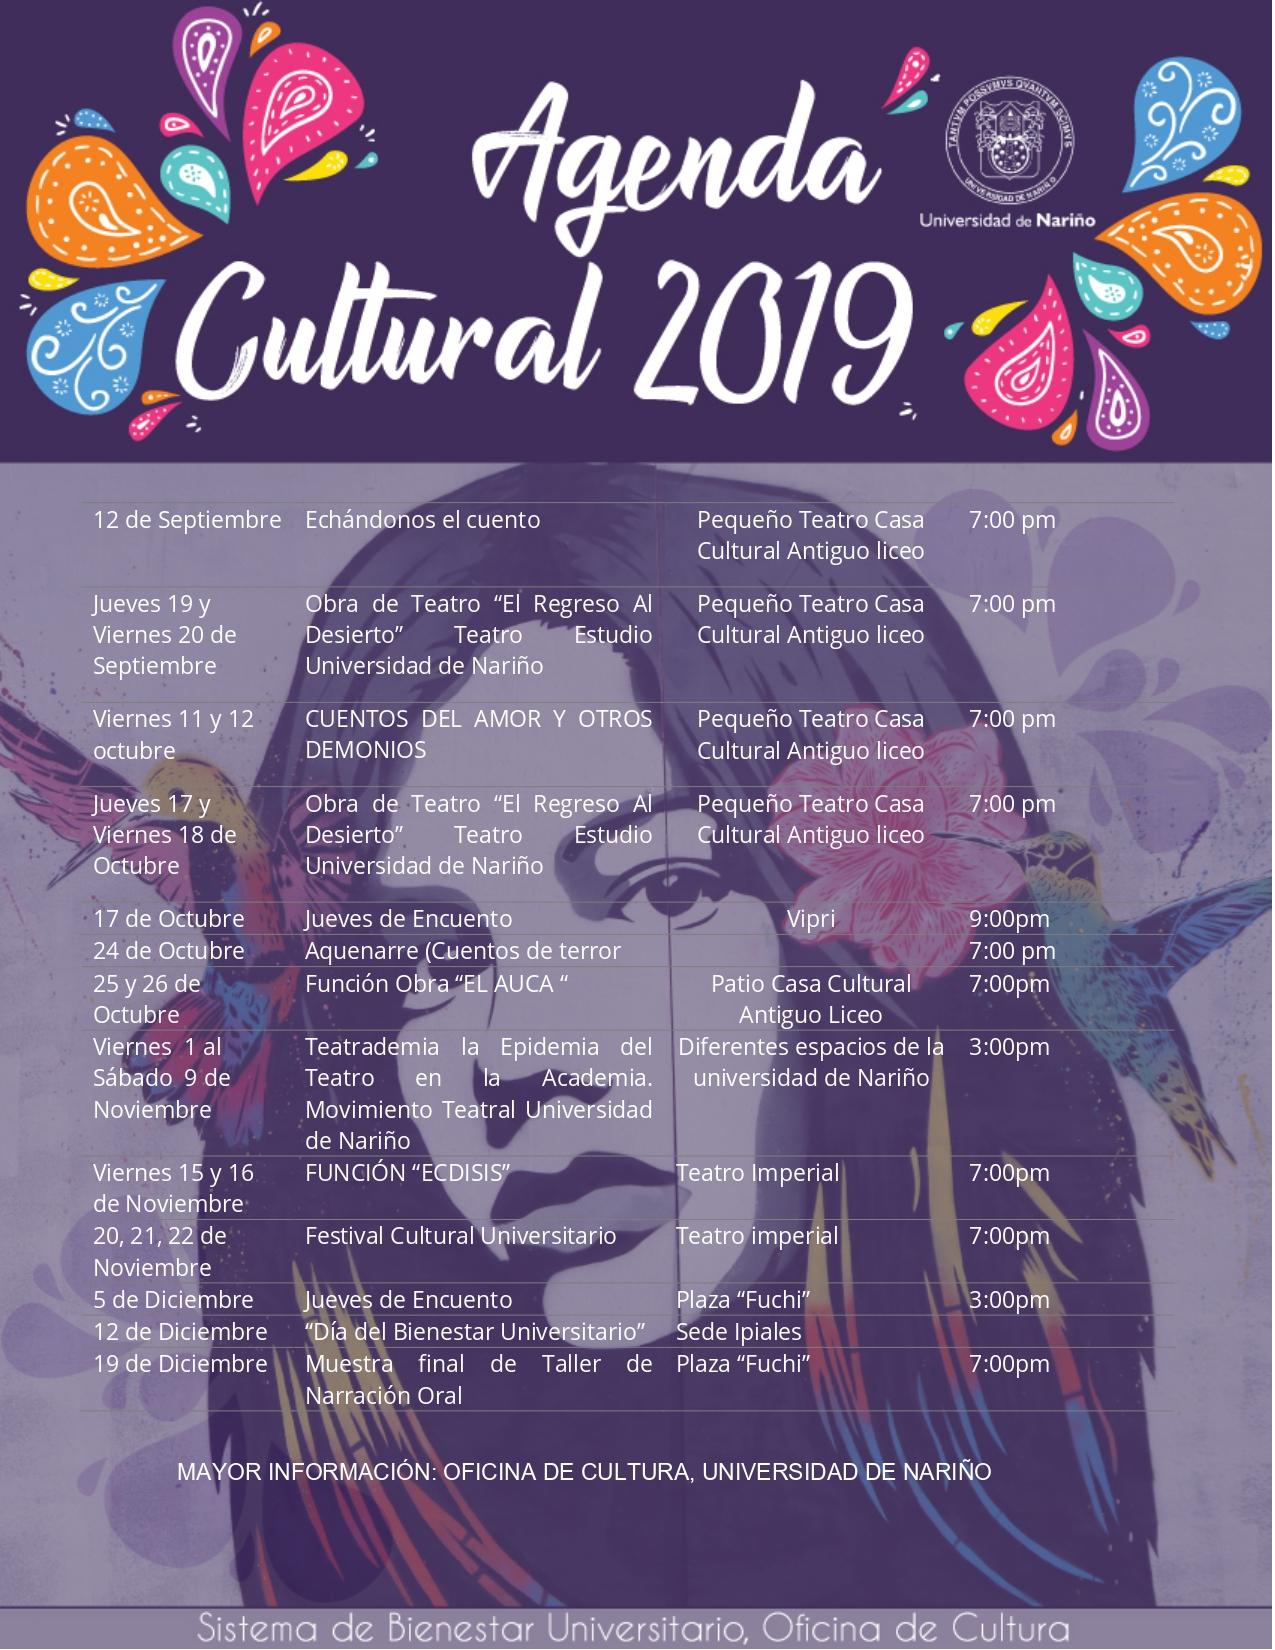 AGENDA CULTURAL 2019-7